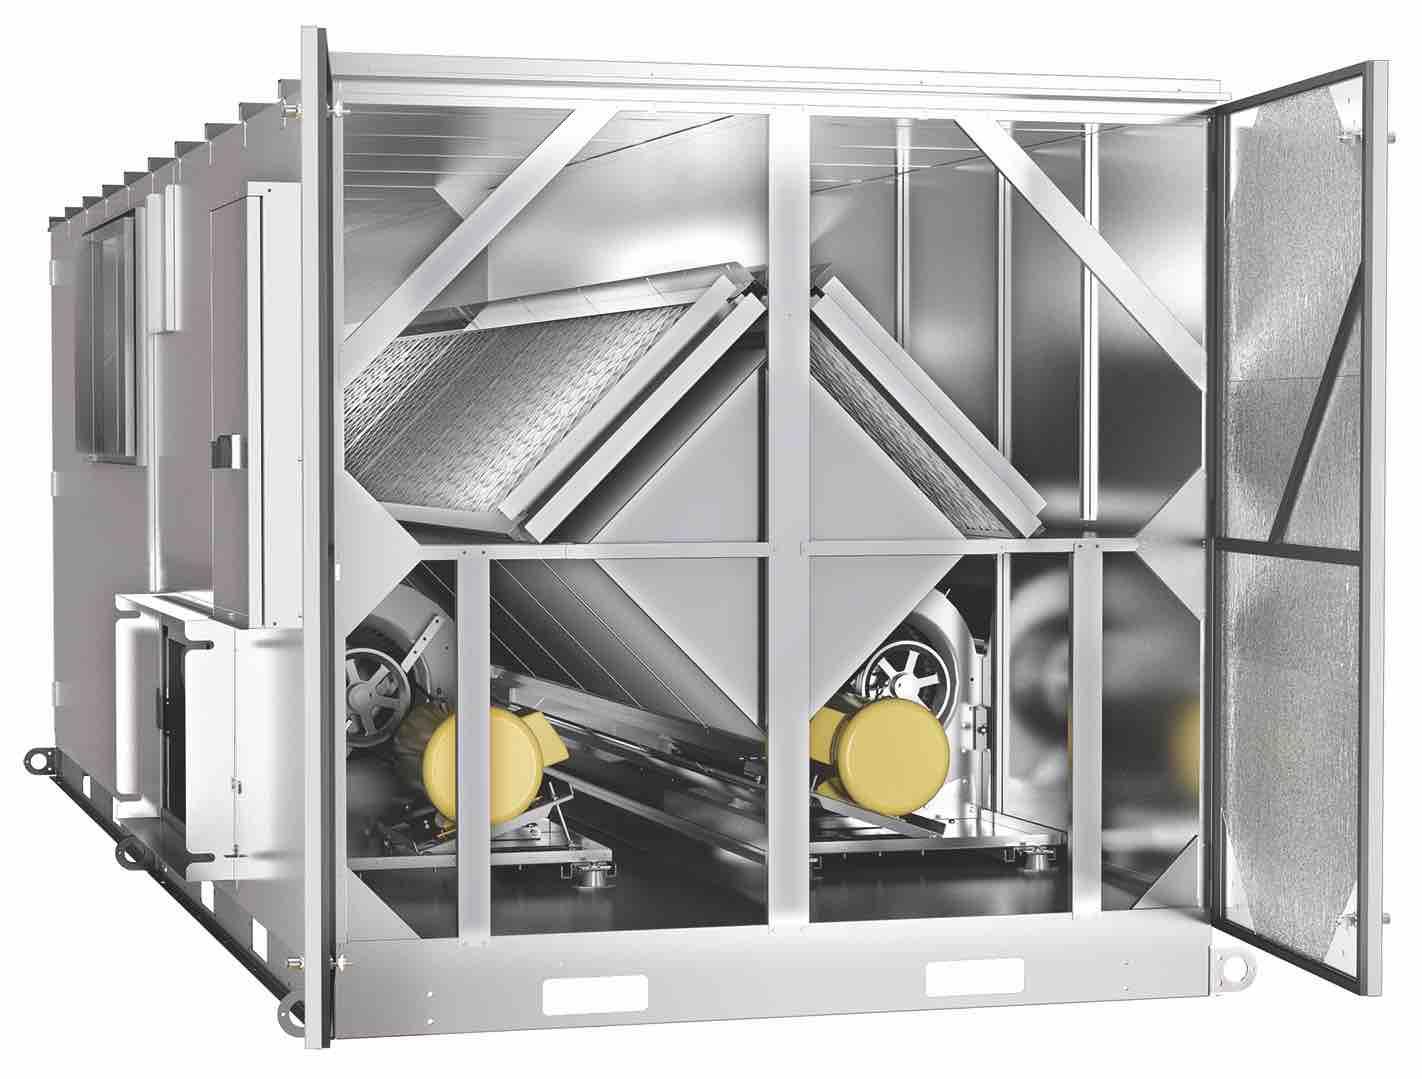 Office RenewAire-Energy-Recovery-Ventilator-ERV